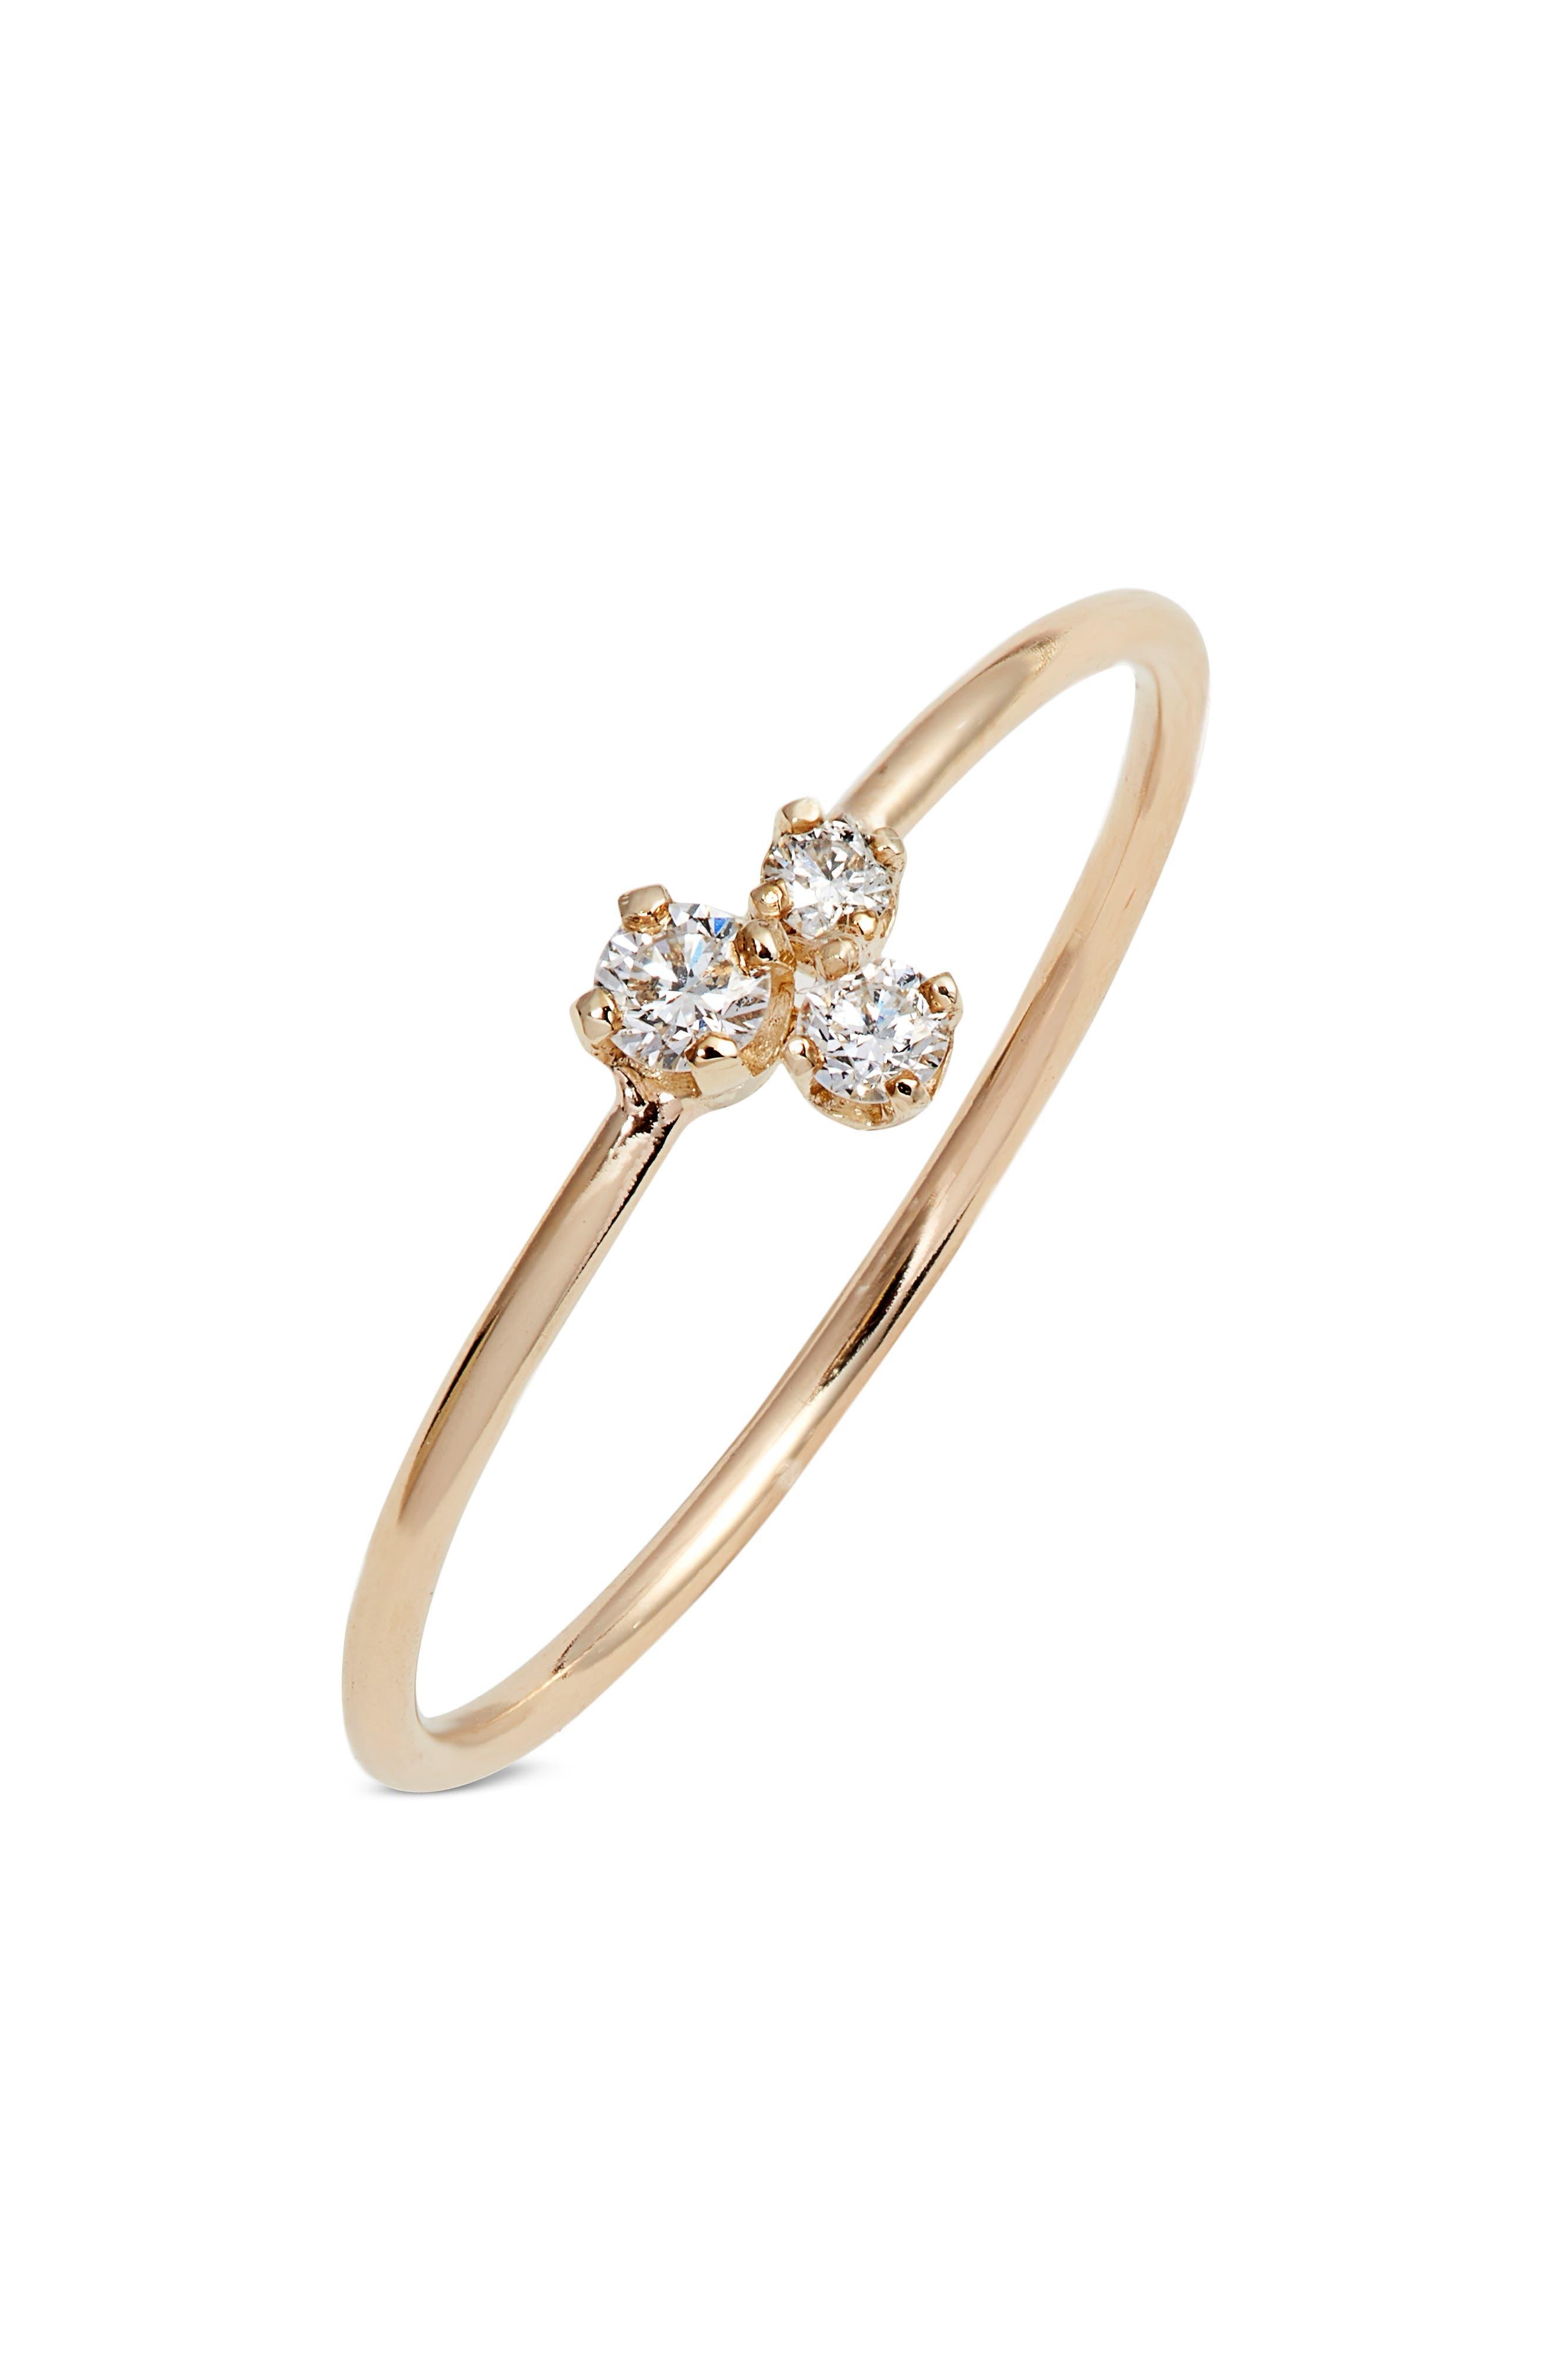 Mixed Diamond Ring,                             Main thumbnail 1, color,                             GOLD/ DIAMOND